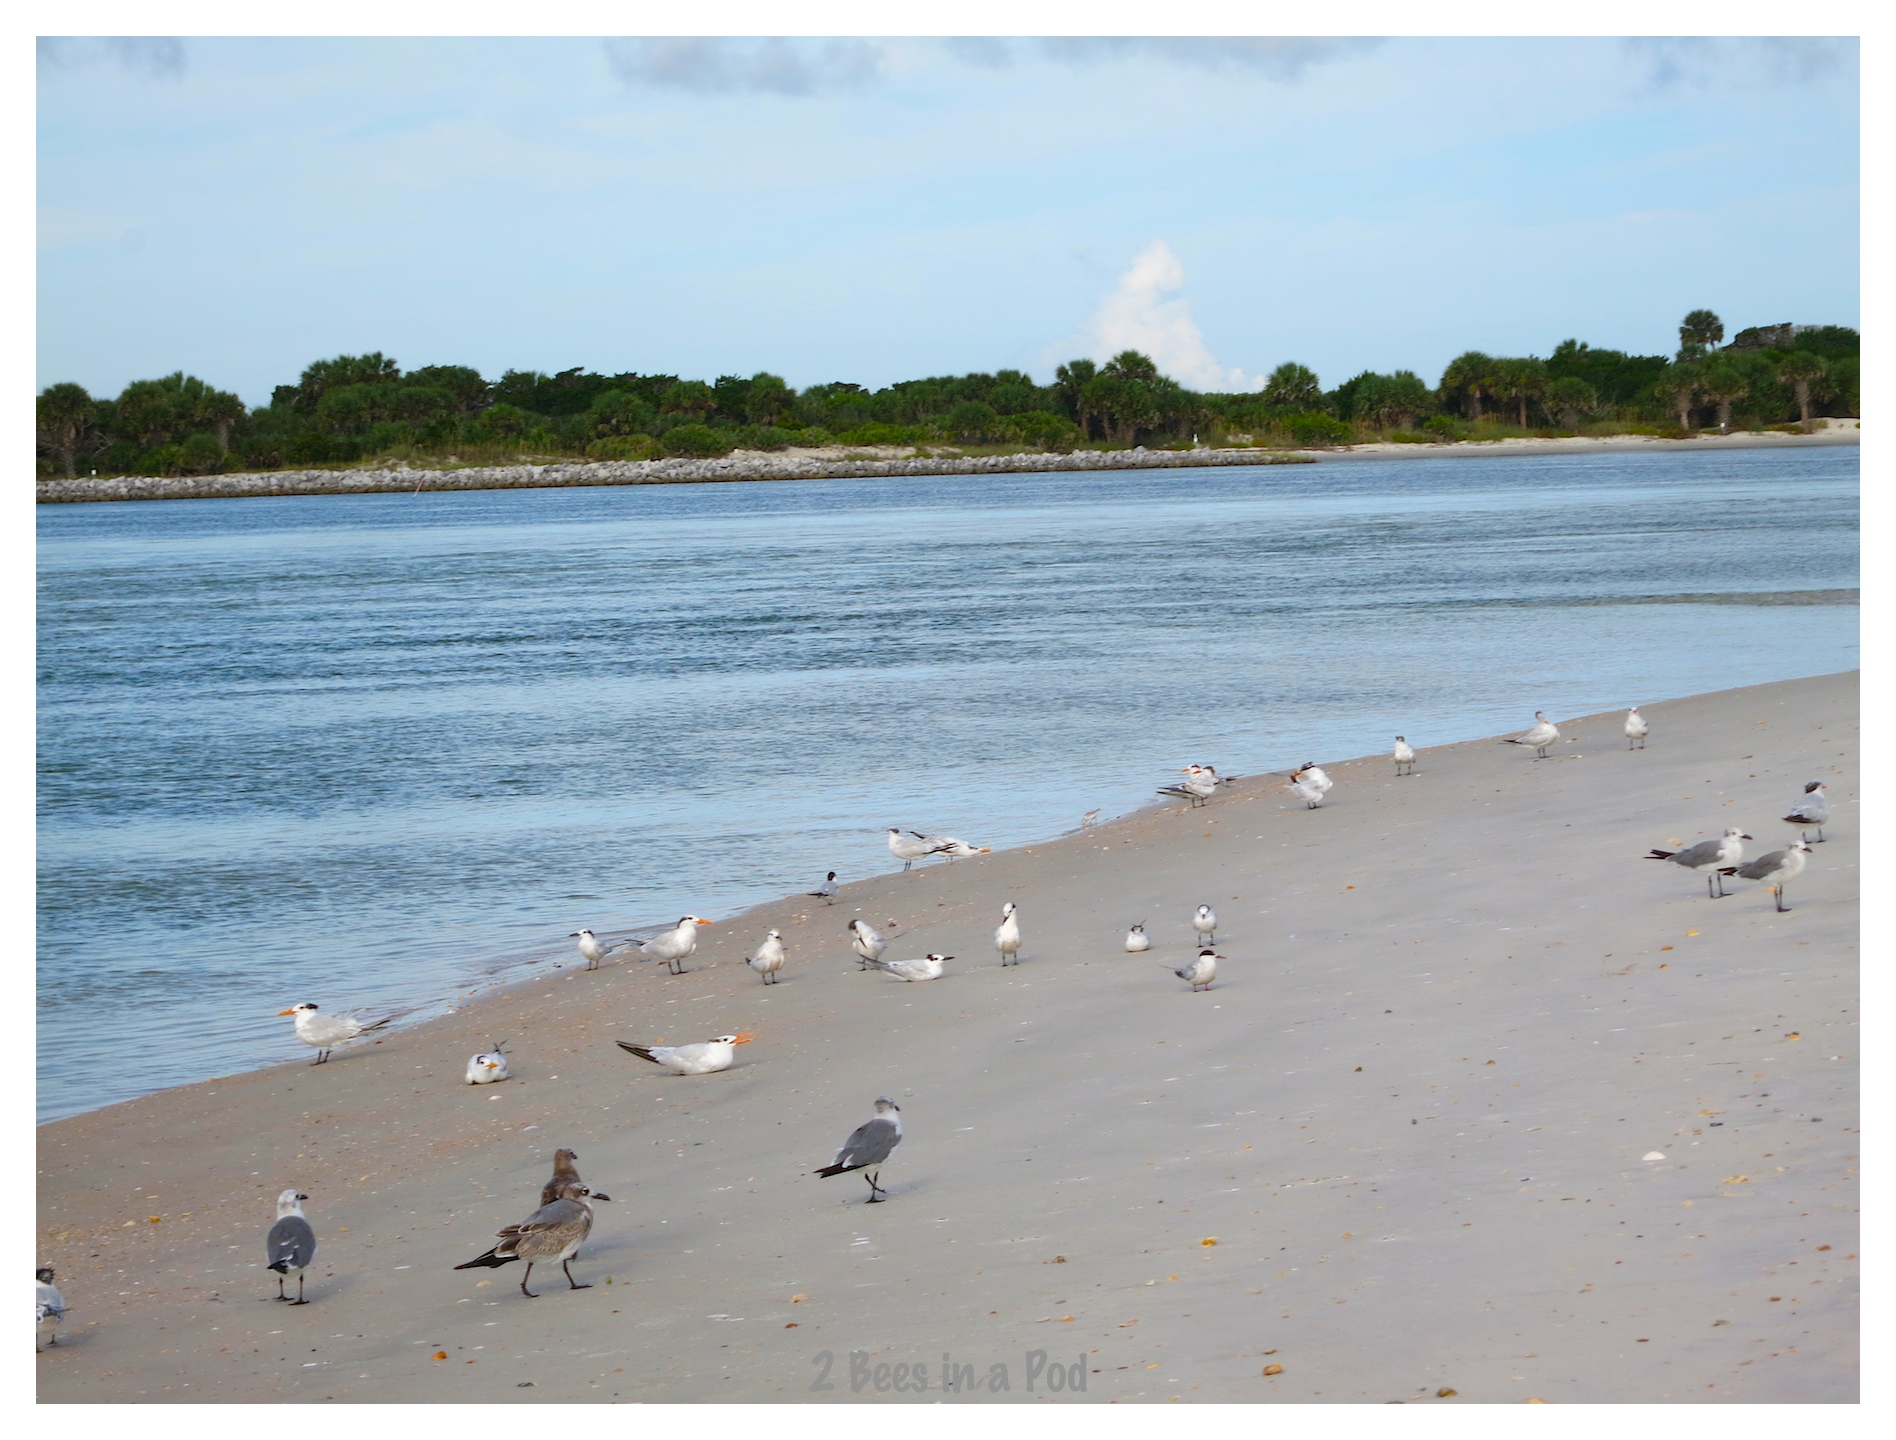 Sunbathing seagulls at Crescent Beach, Florida